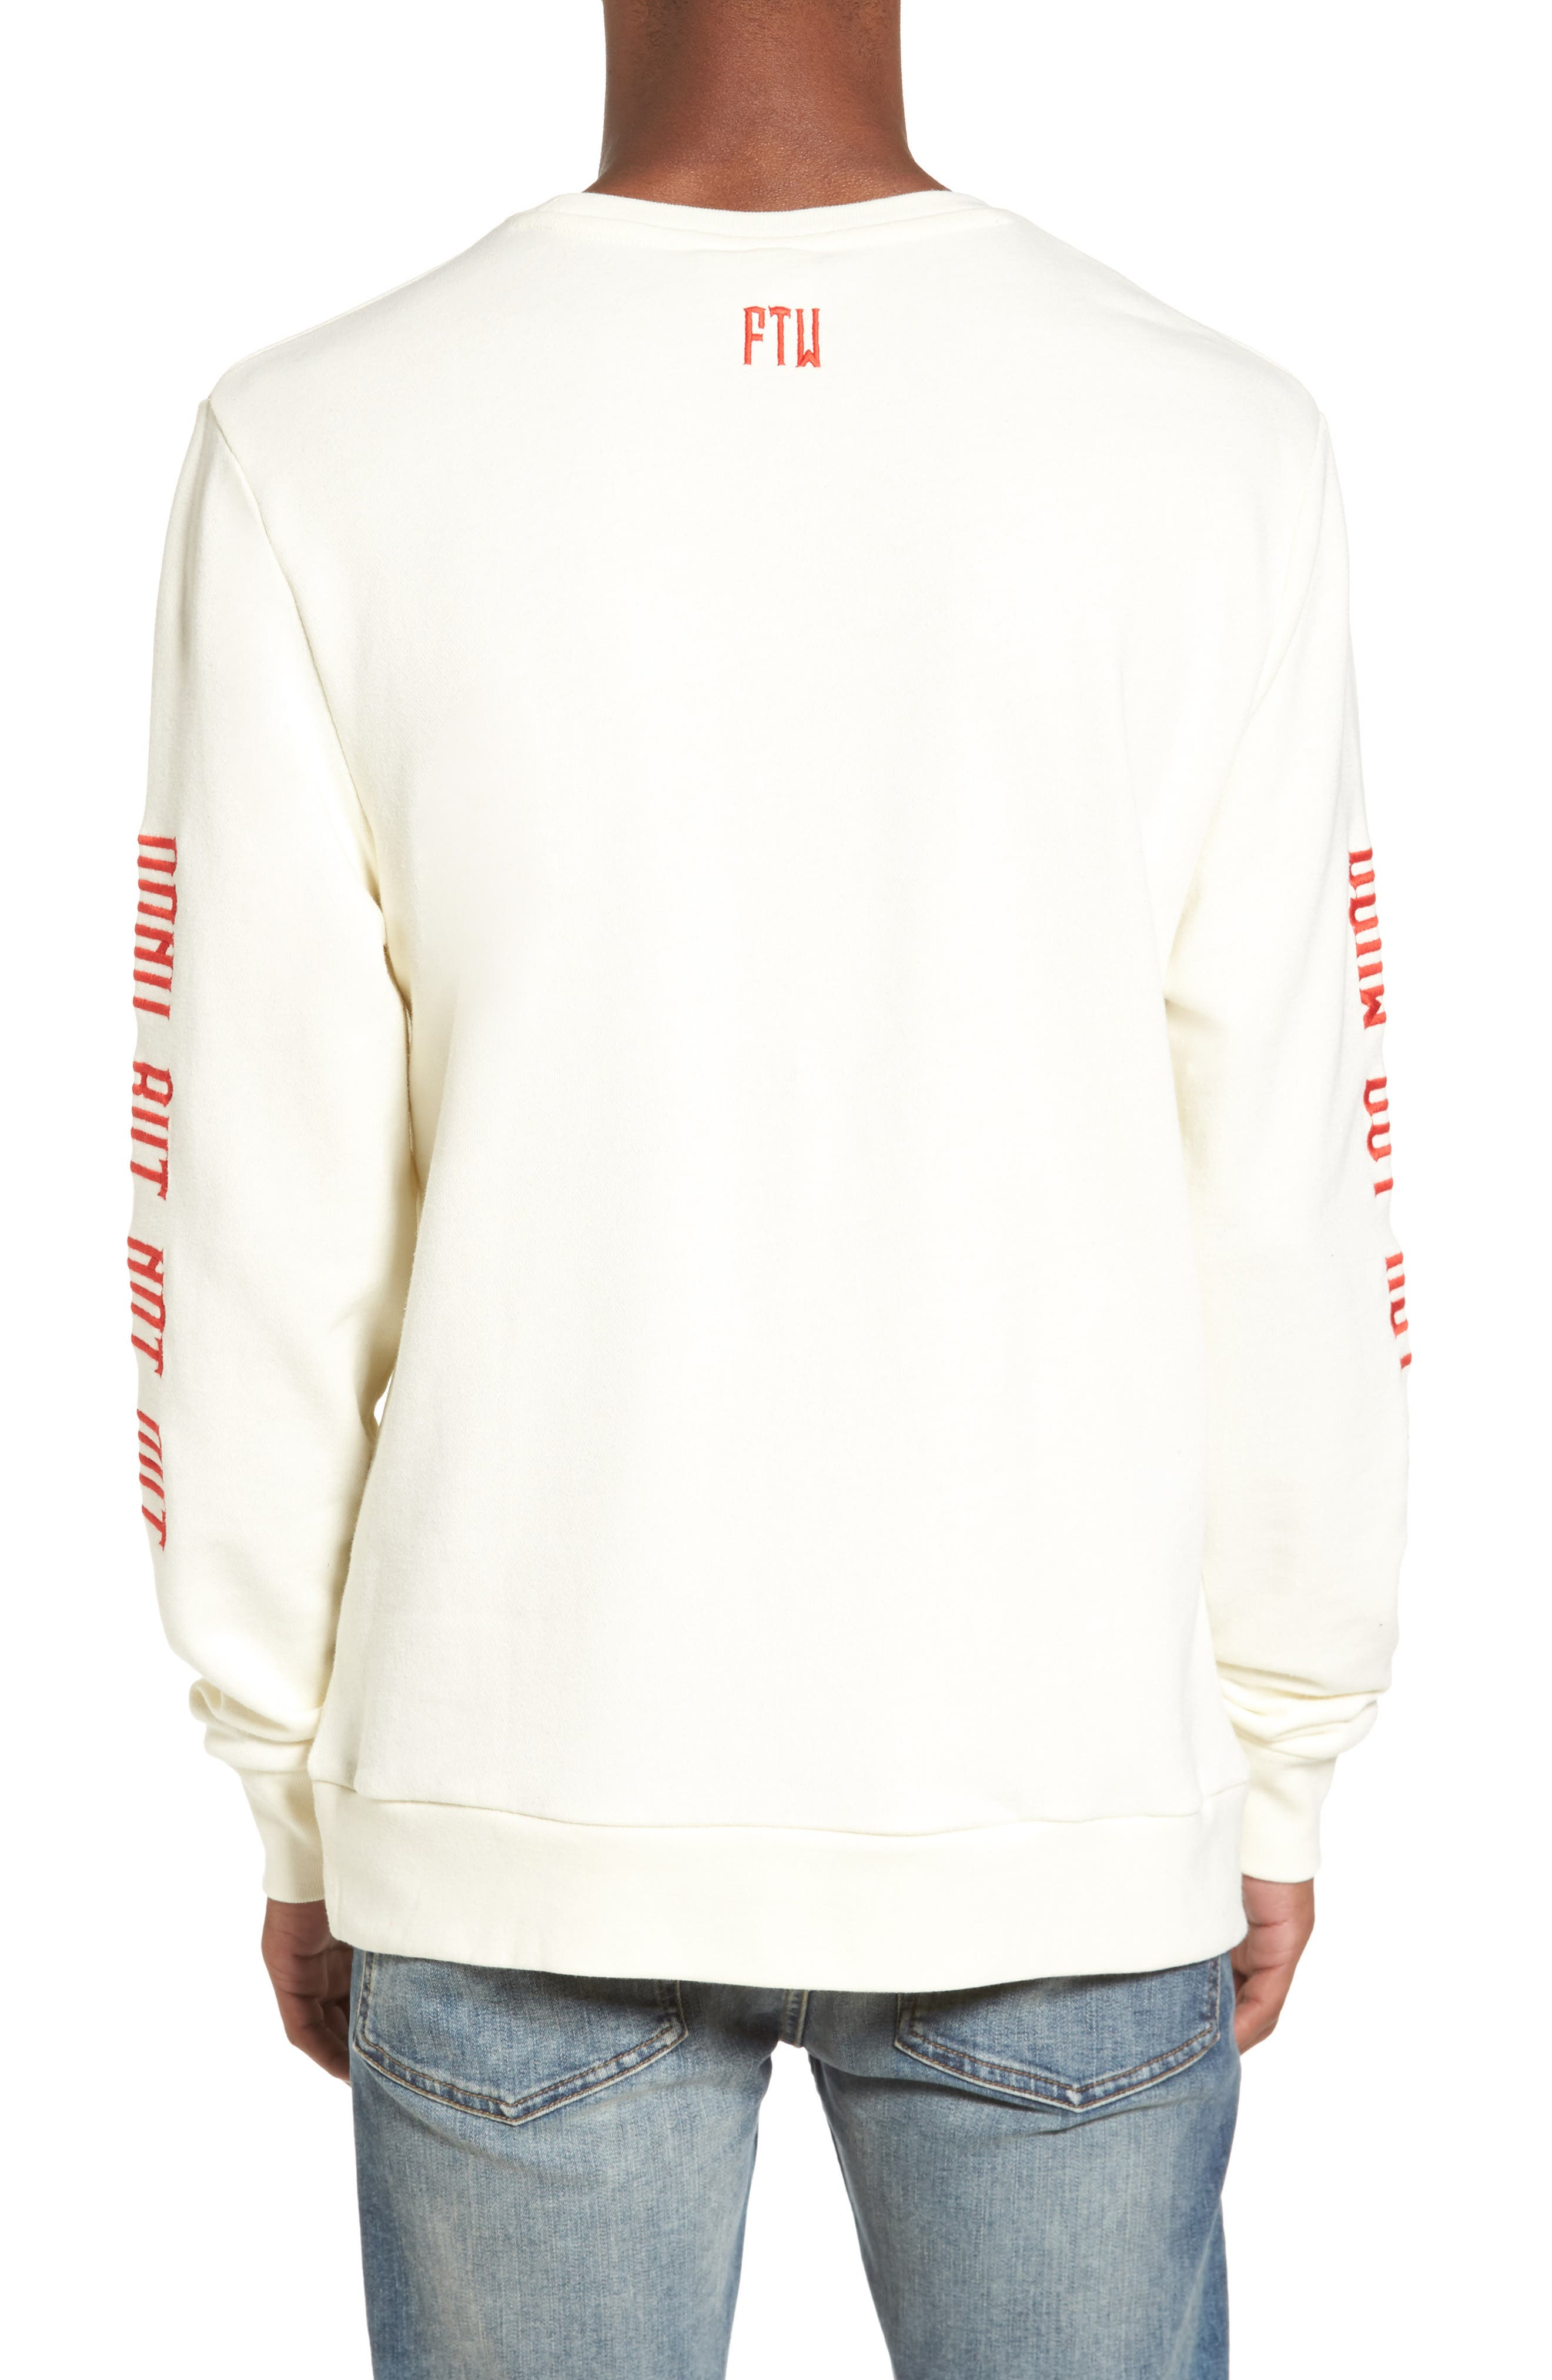 Up North Fleece Sweatshirt,                             Alternate thumbnail 2, color,                             Bone